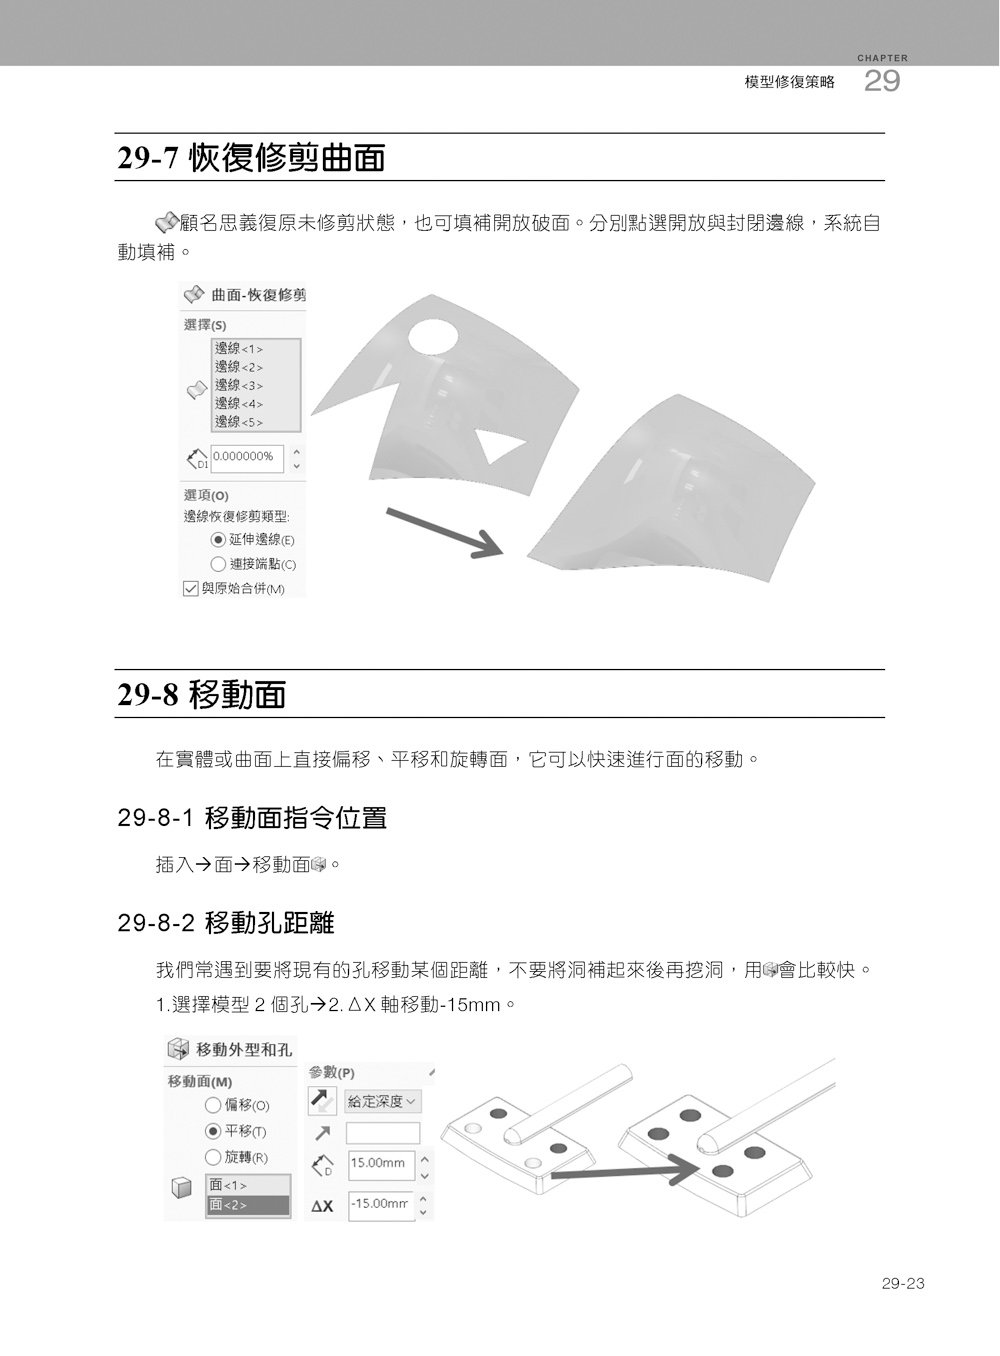 Solidworks 專業工程師訓練手冊[9]-模型轉檔與修復策略-preview-26